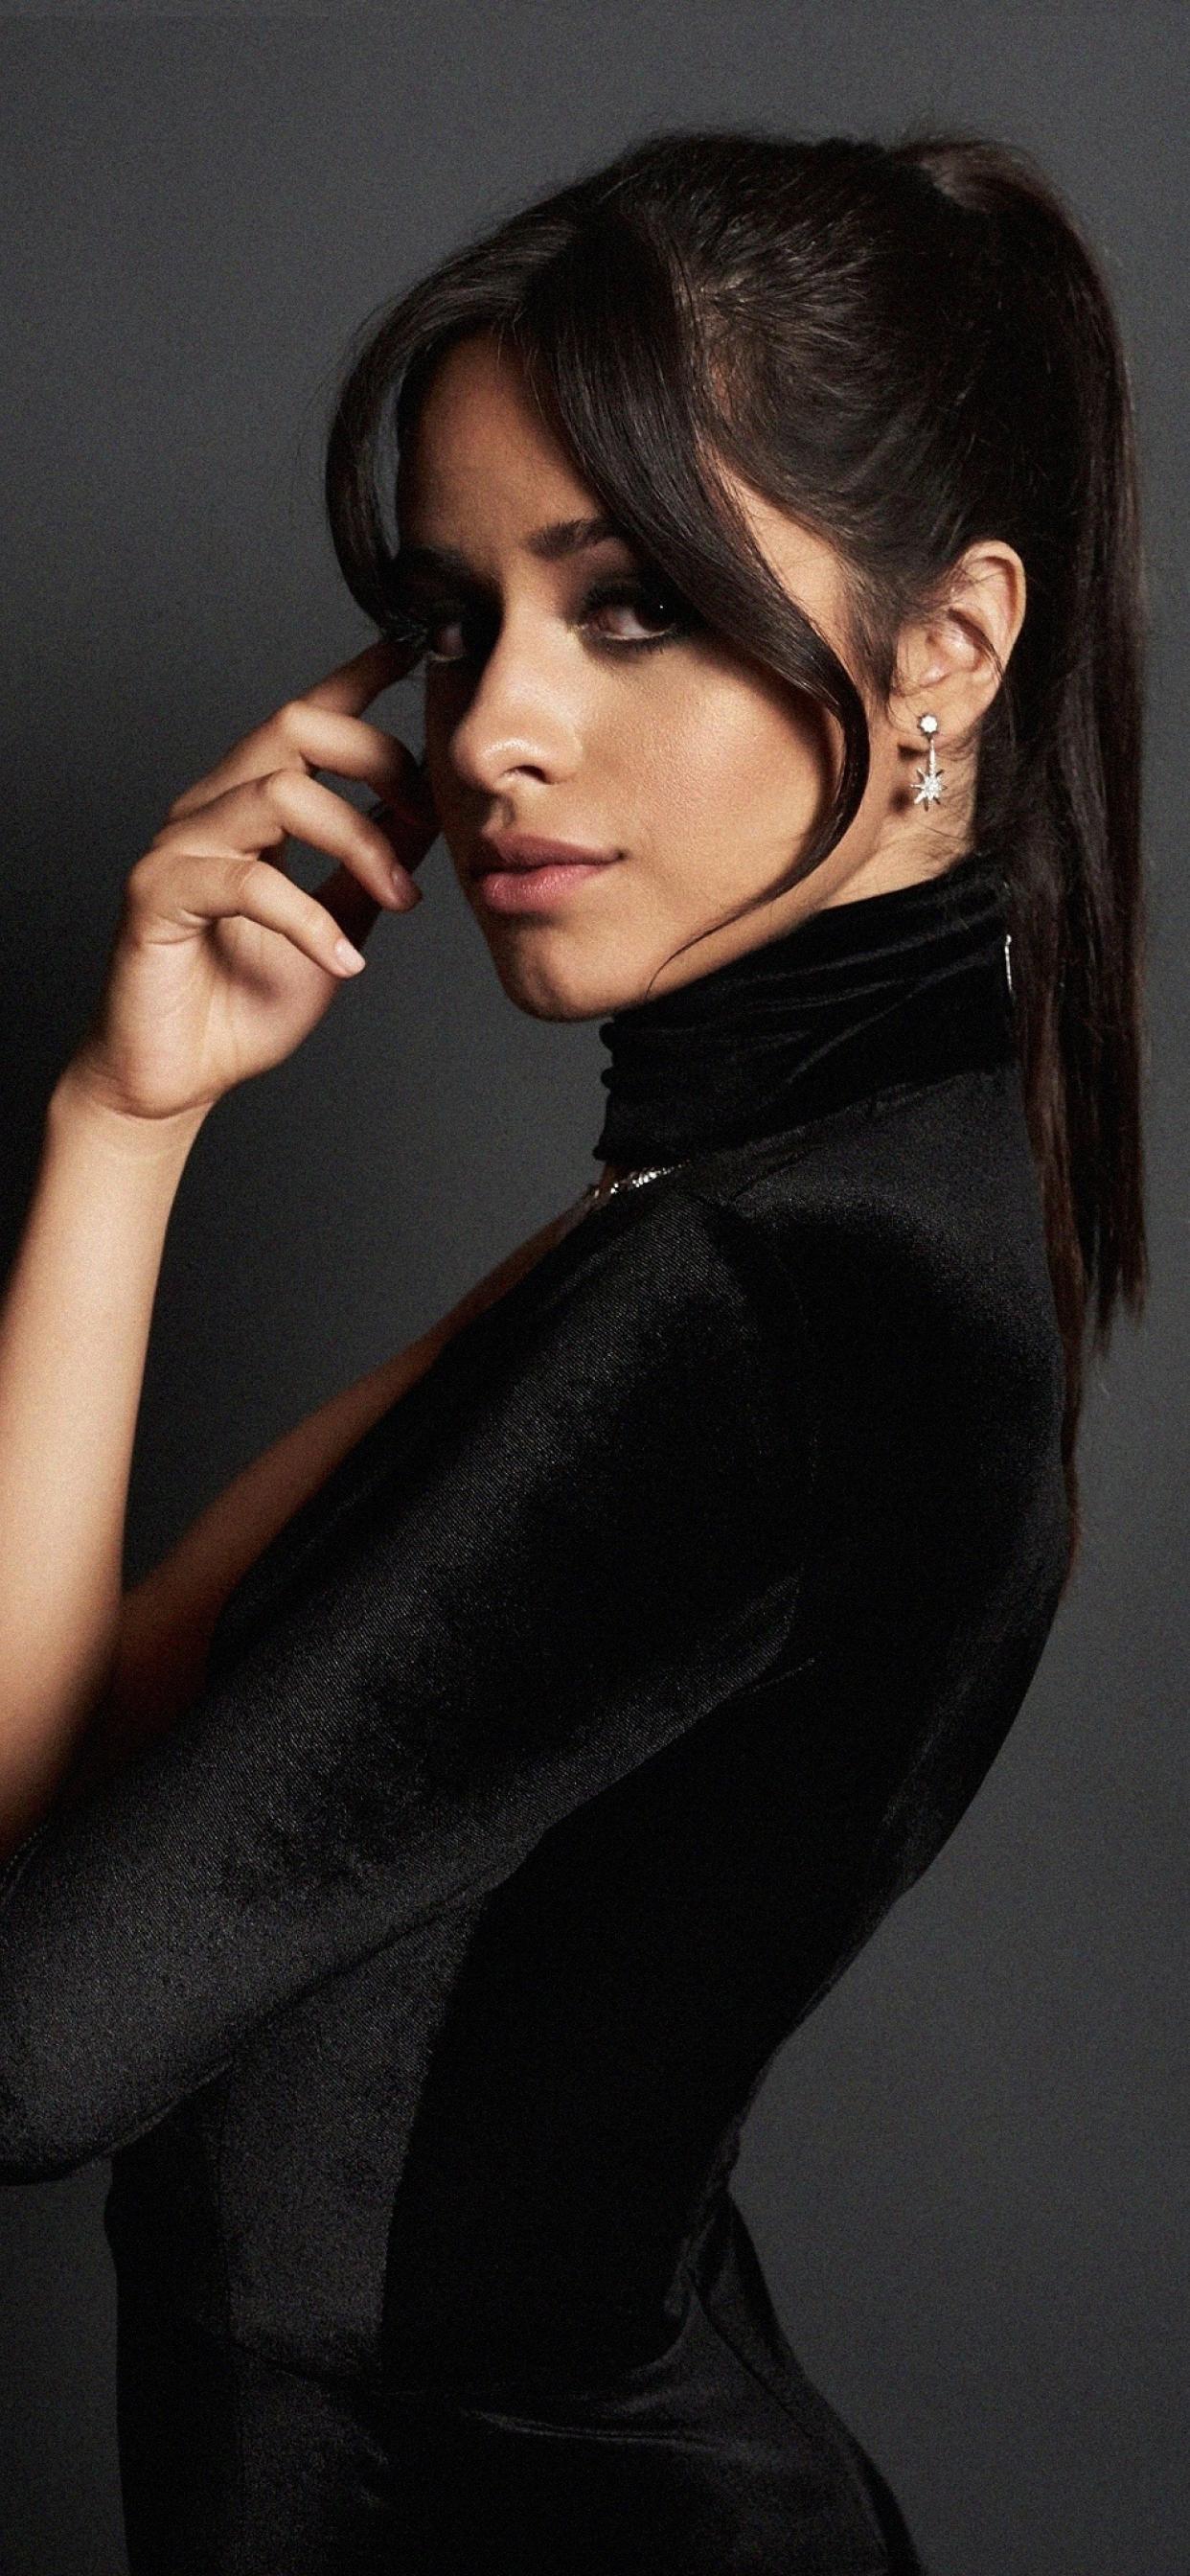 1242x2688 Camila Cabello 4K Photoshoot 2020 Iphone XS MAX ...